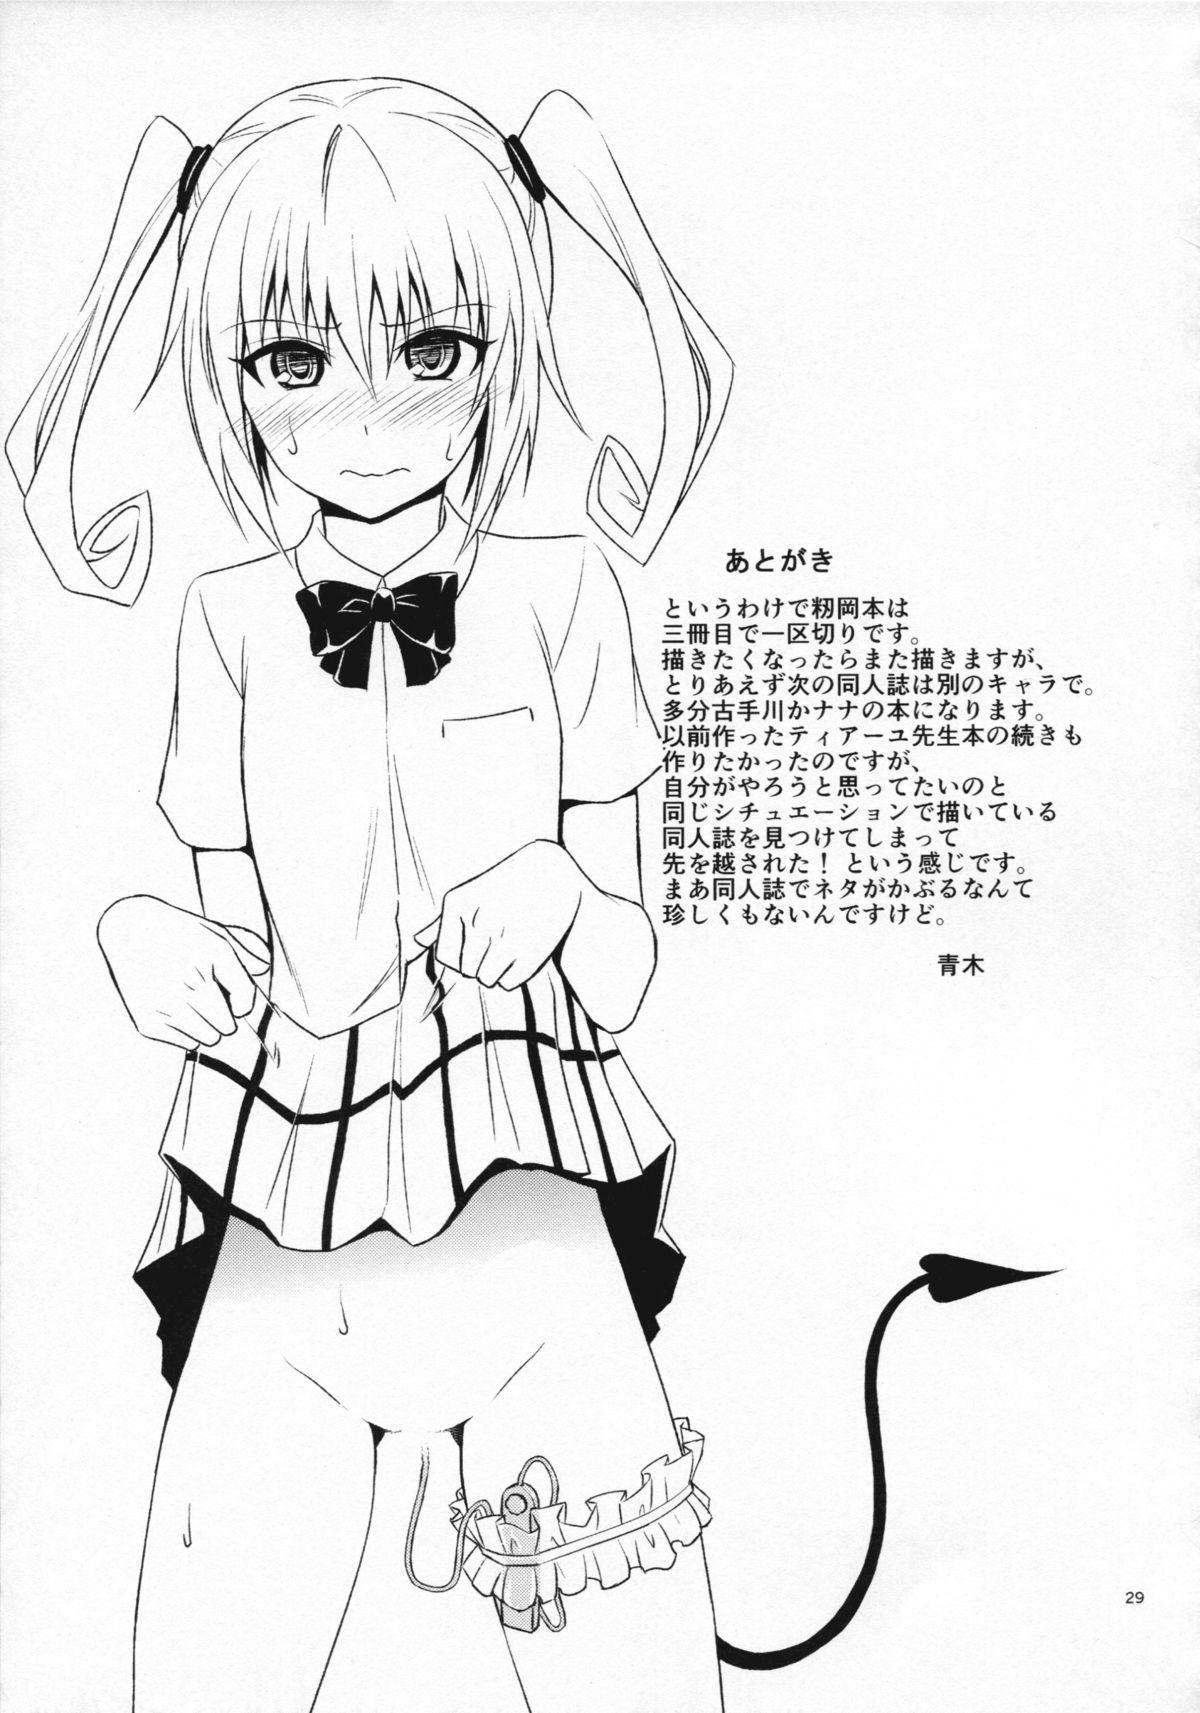 Momioka no Hatsujou | Momioka's Horniness 27